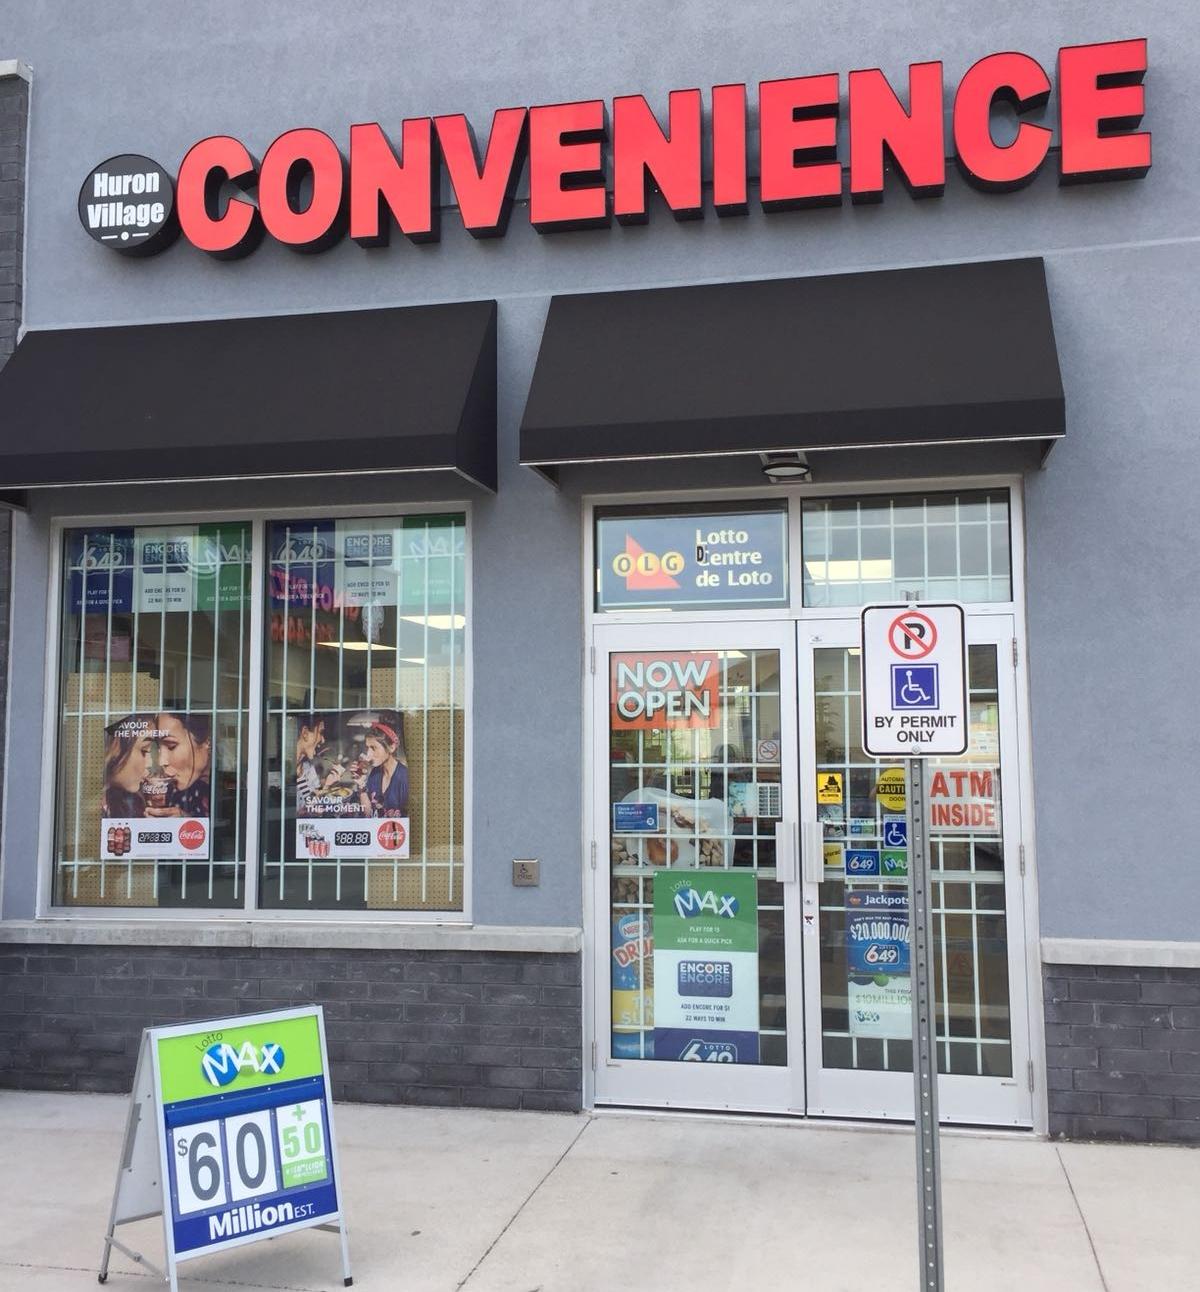 Huron Village Convenience Exterior.jpeg